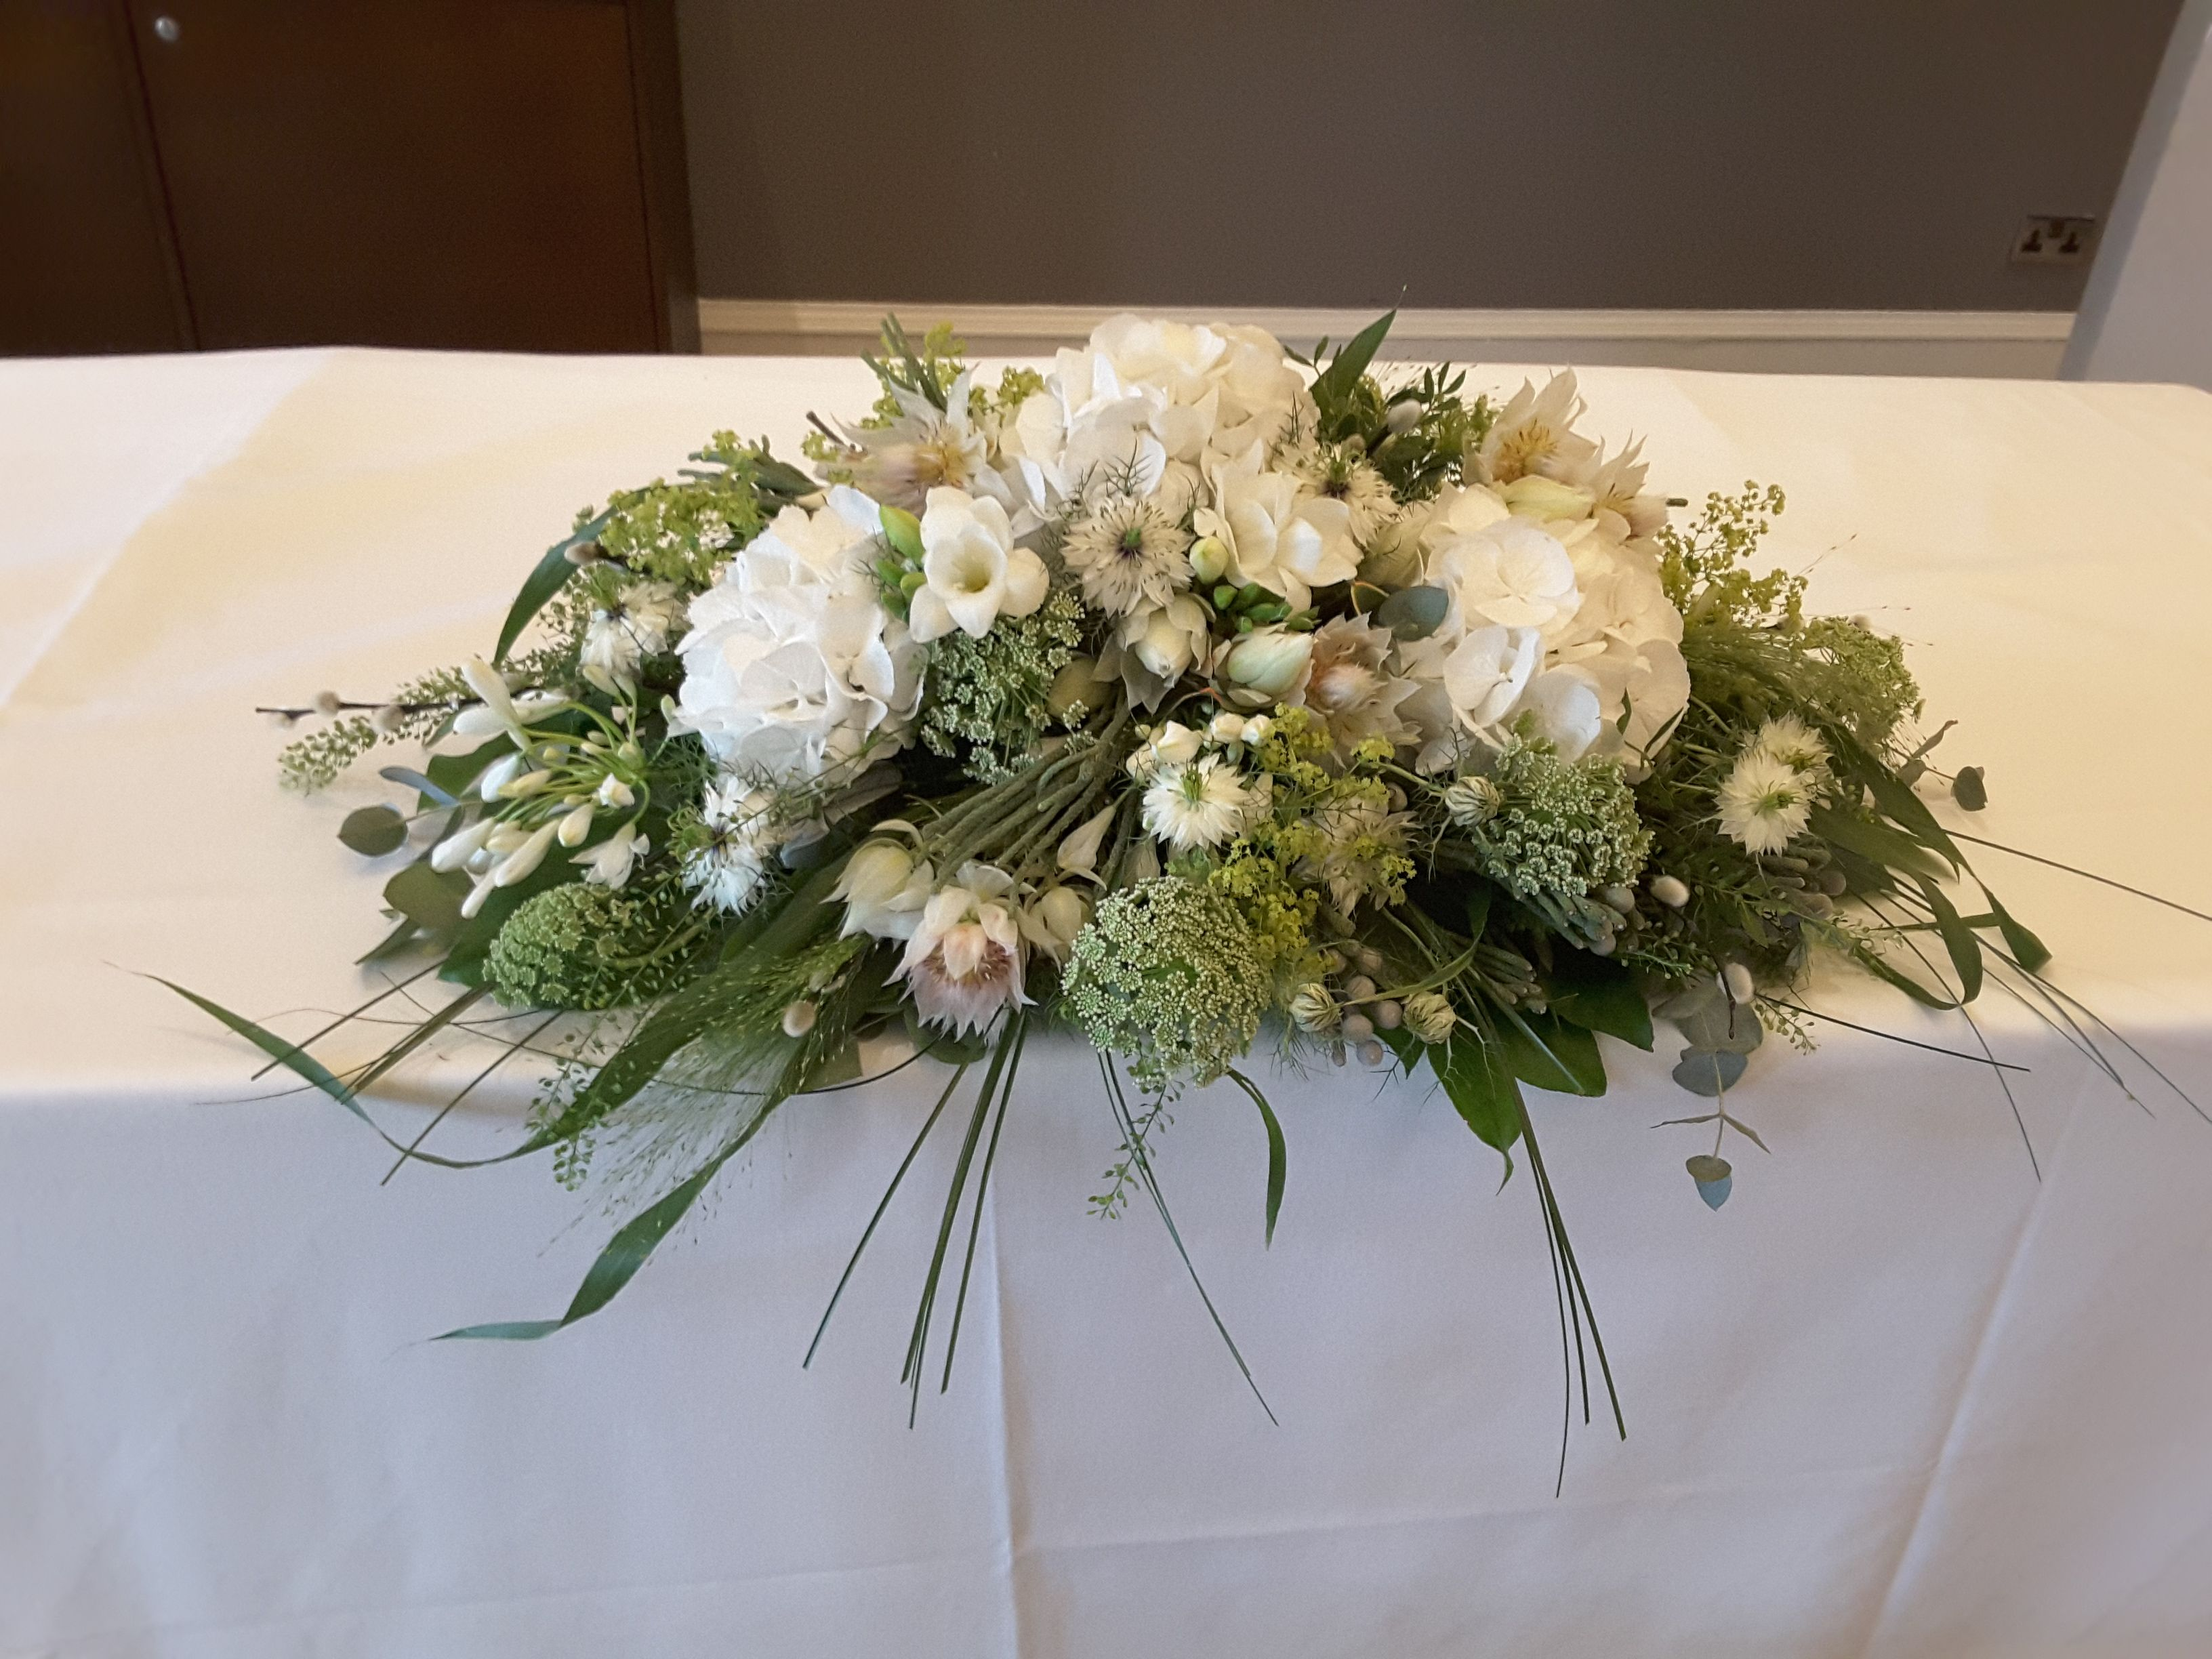 Registrar Table Arrangement Of White Flowers Including Hydrangeas